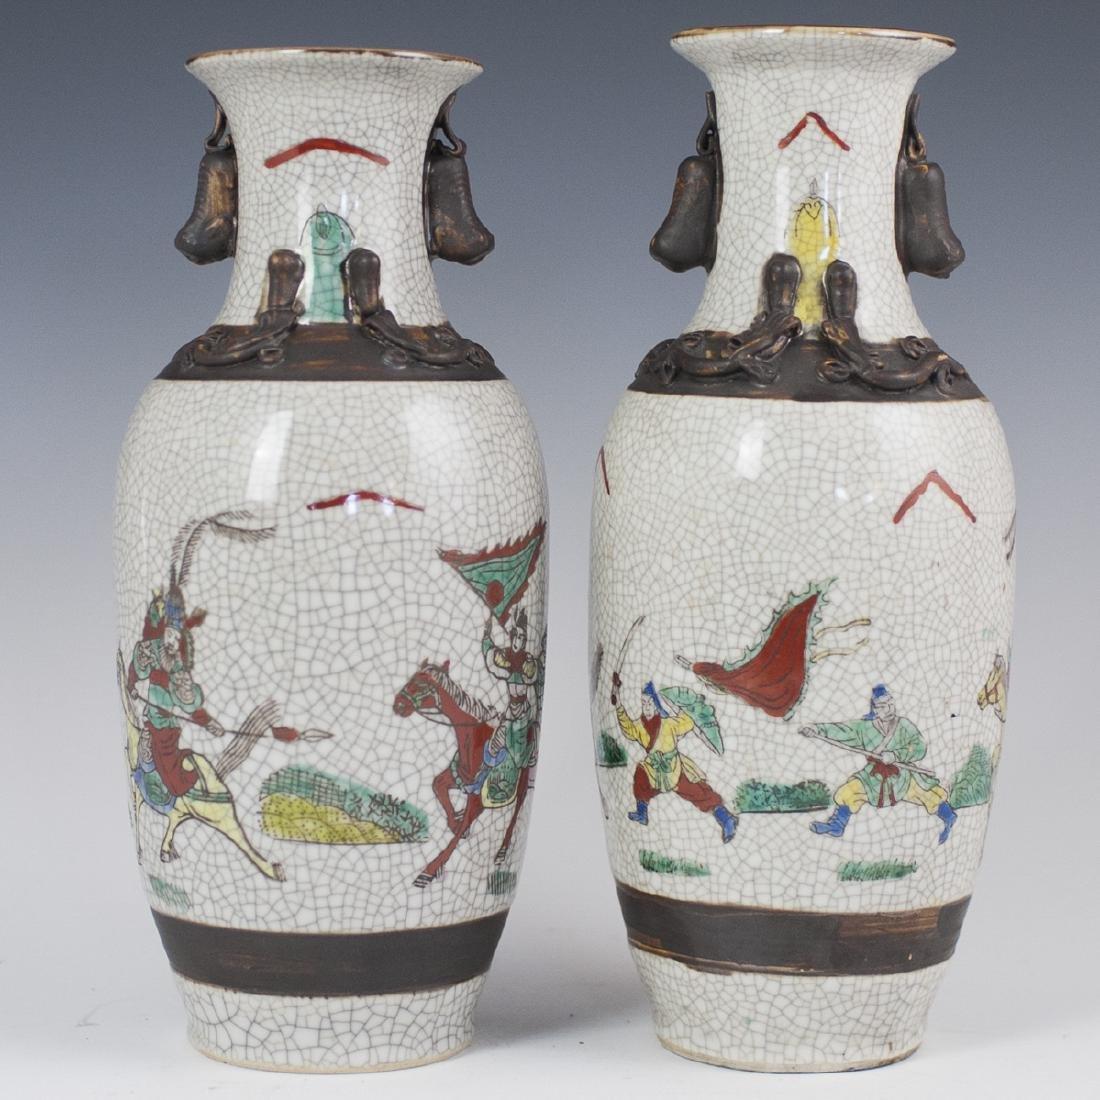 Chinese Crackle Glazed Warrior Vases